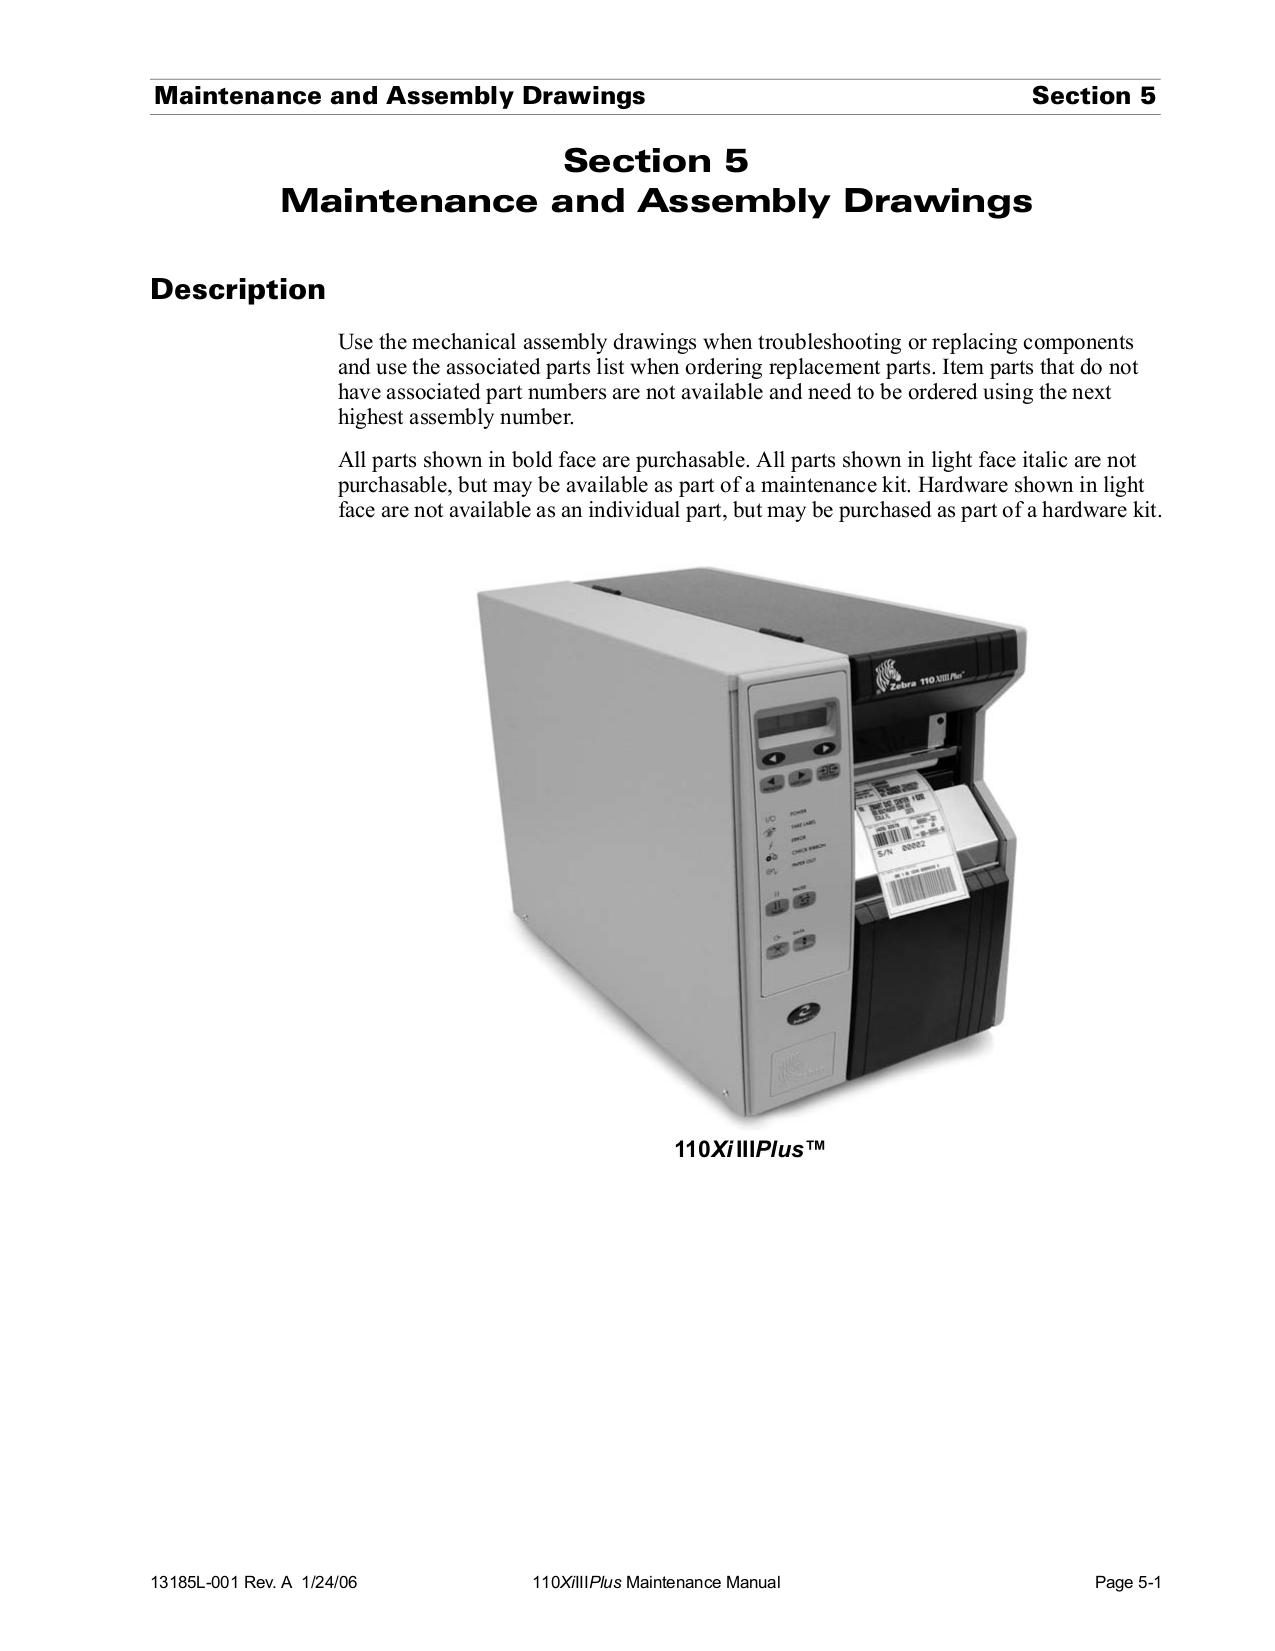 download free pdf for zebra 110xiiiiplus printer manual rh umlib com Refurbished Zebra Printers zebra printer 110xiiii plus manual pdf